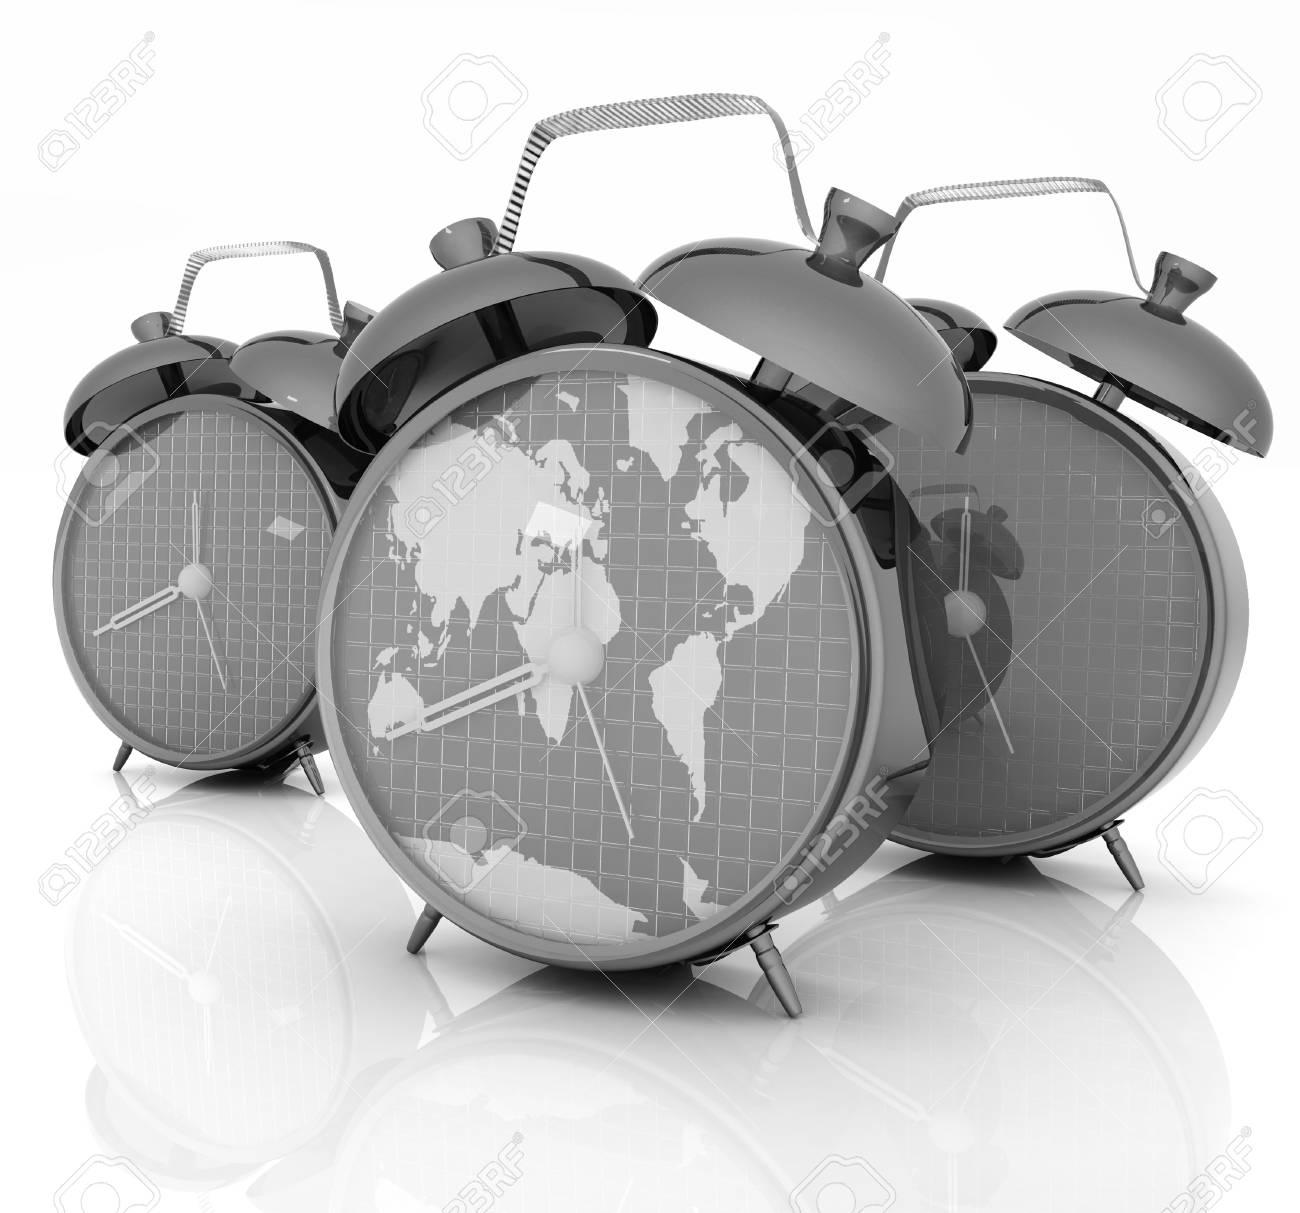 Alarm clock of world map and alarm clocks stock photo picture and alarm clock of world map and alarm clocks stock photo 32206140 gumiabroncs Image collections